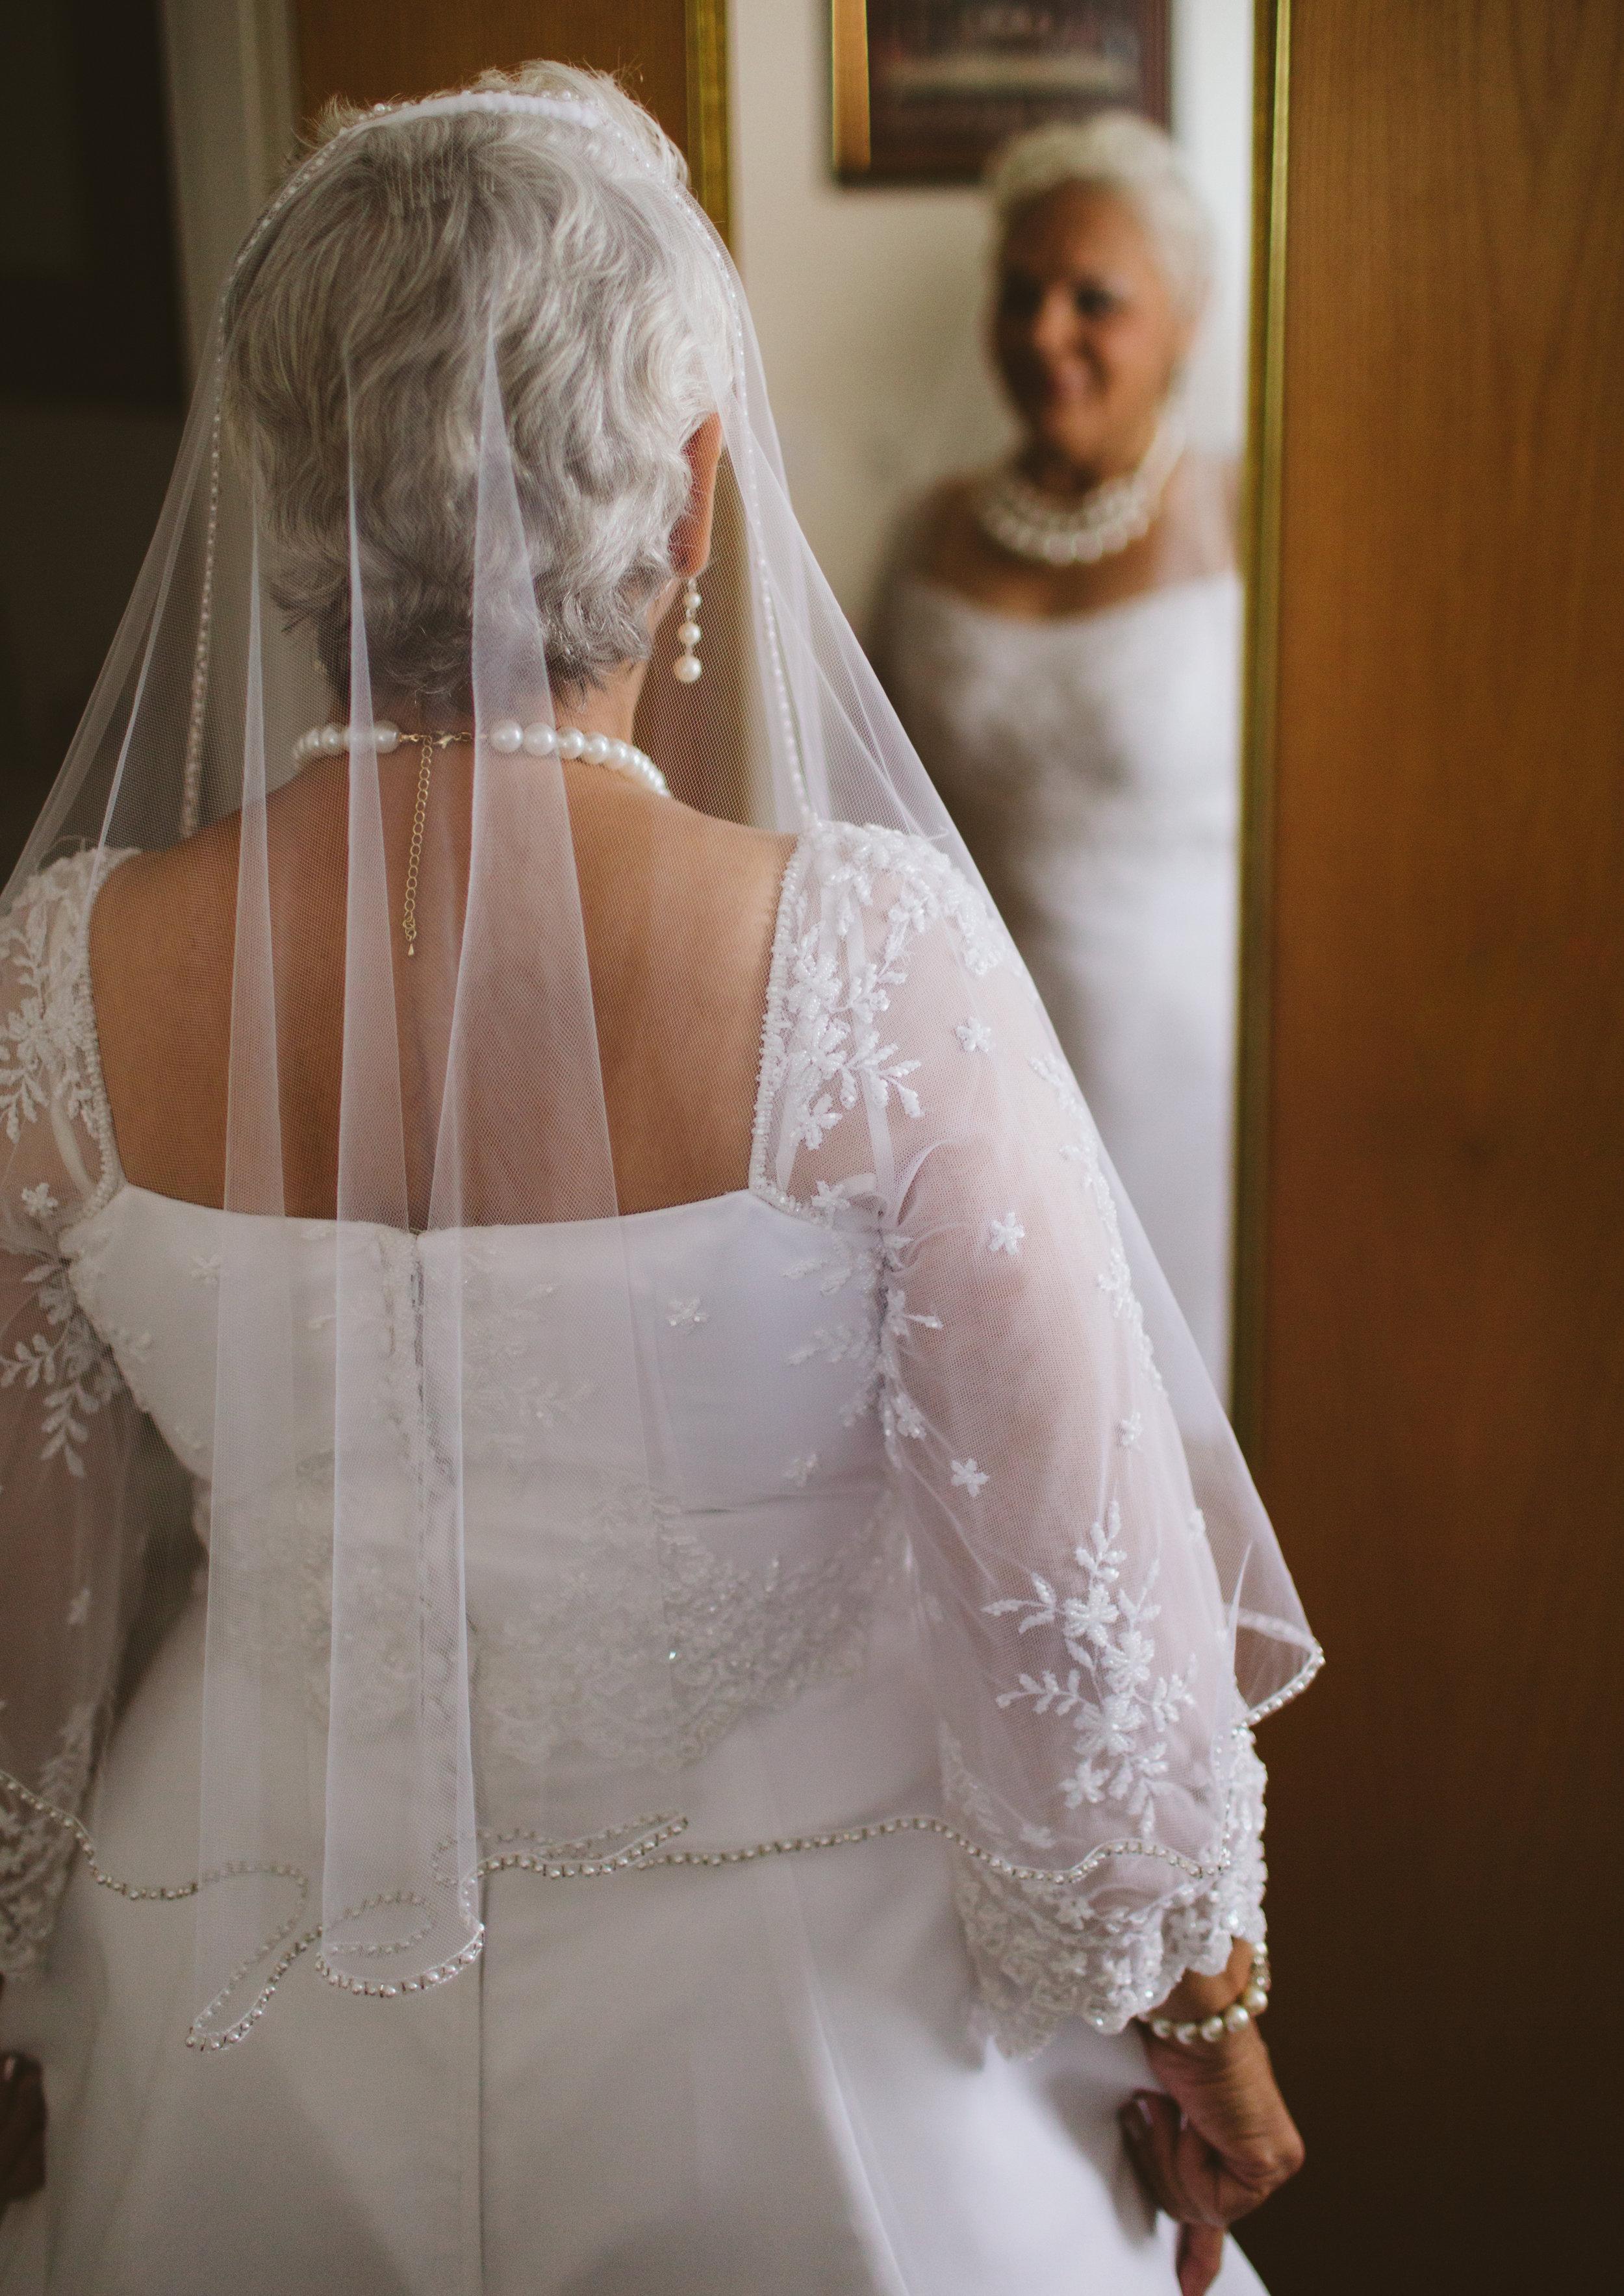 wedding | Vanessa Boy Photography | vanessaboy.com |-24.jpg